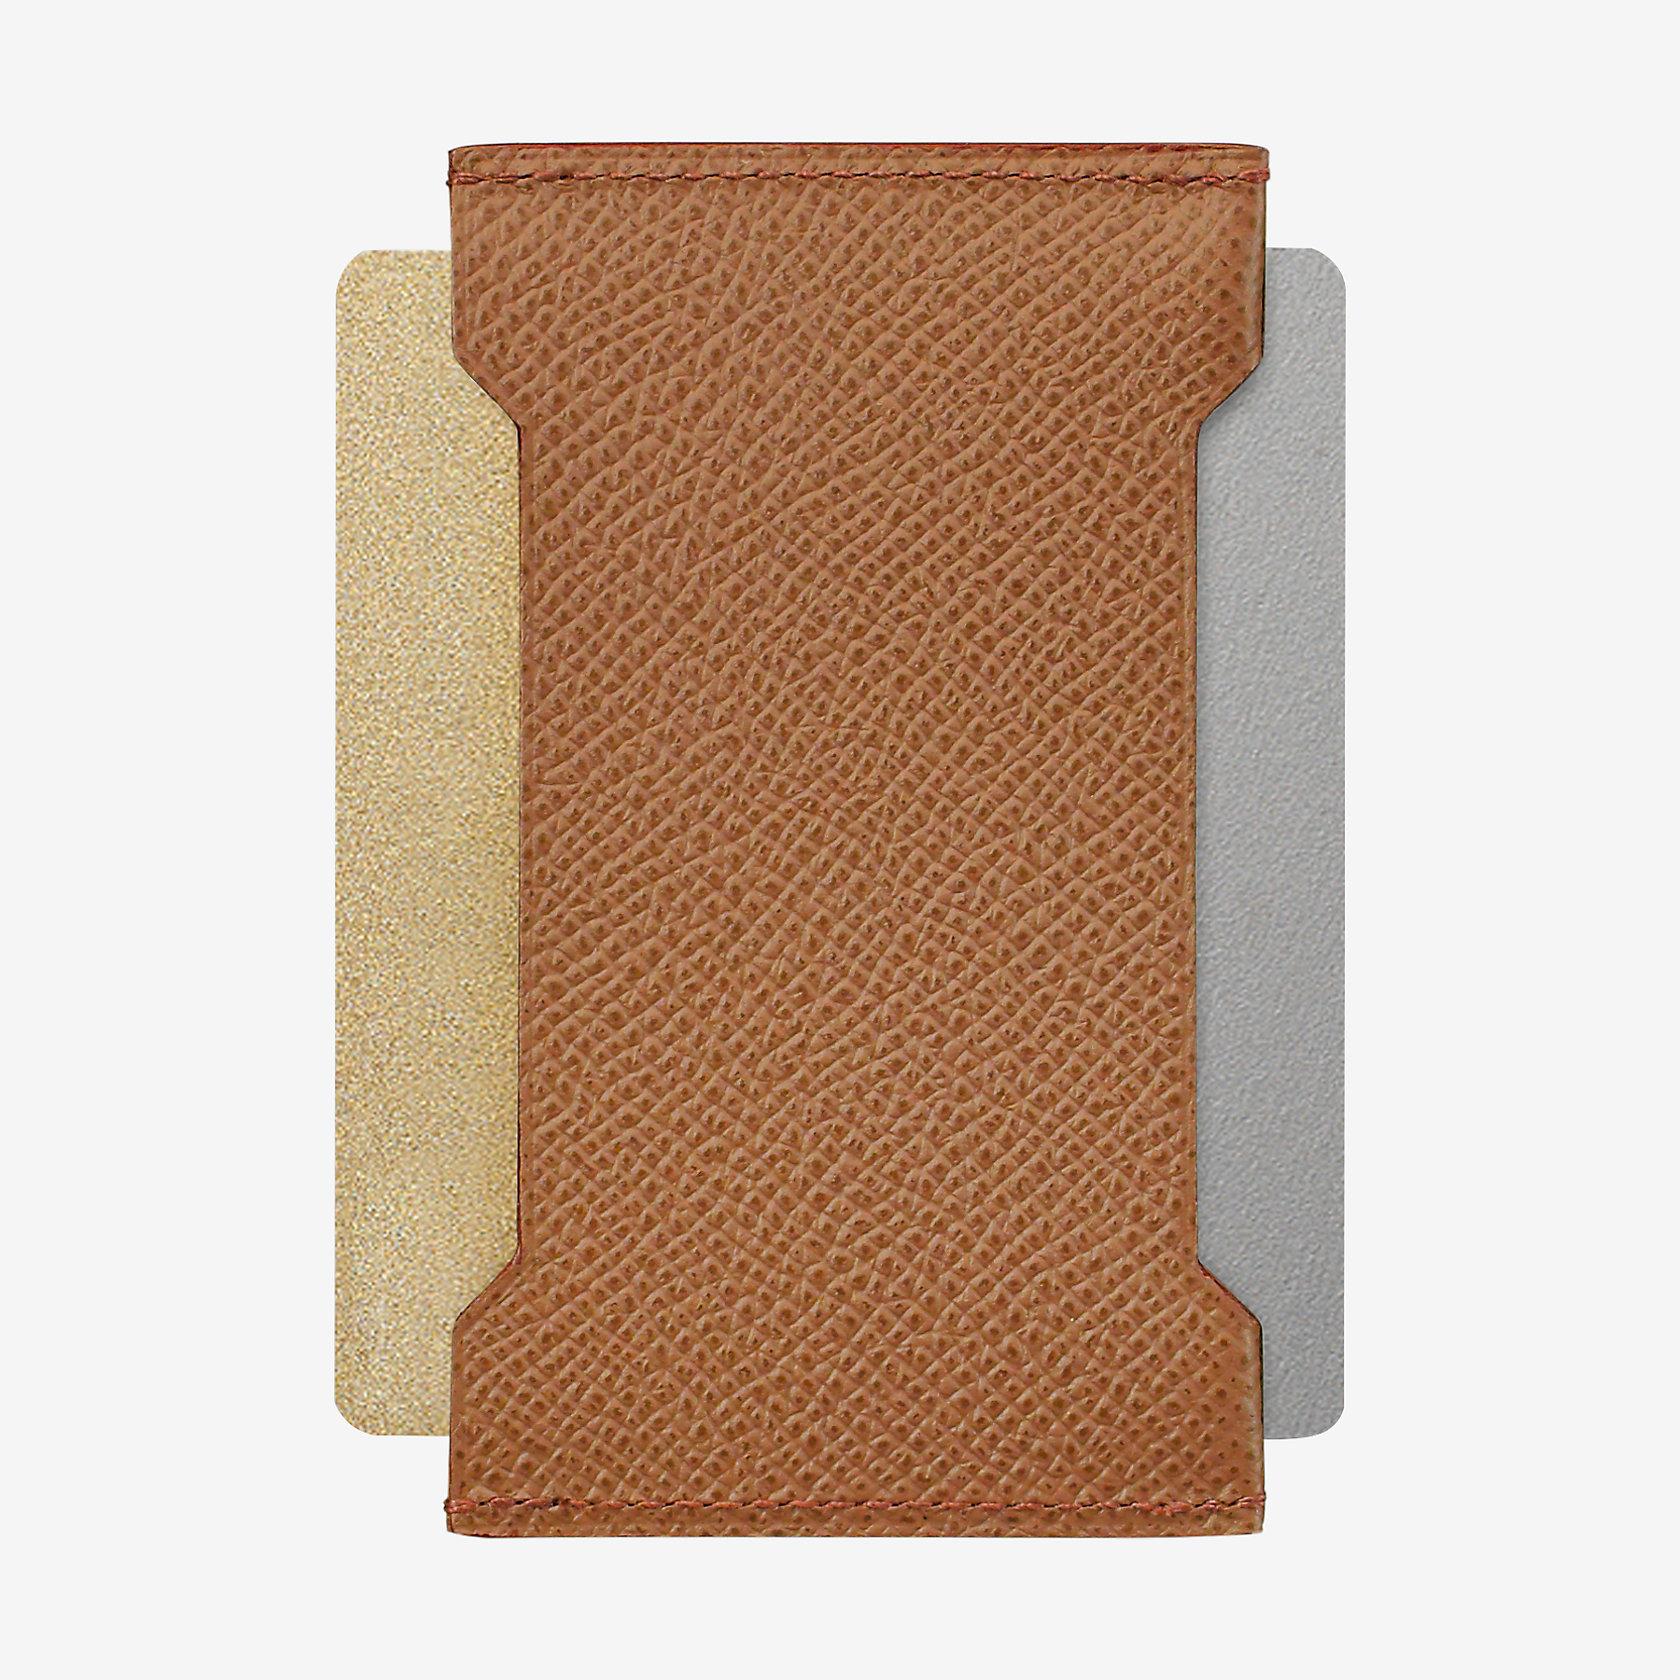 Manhattan card holder small model